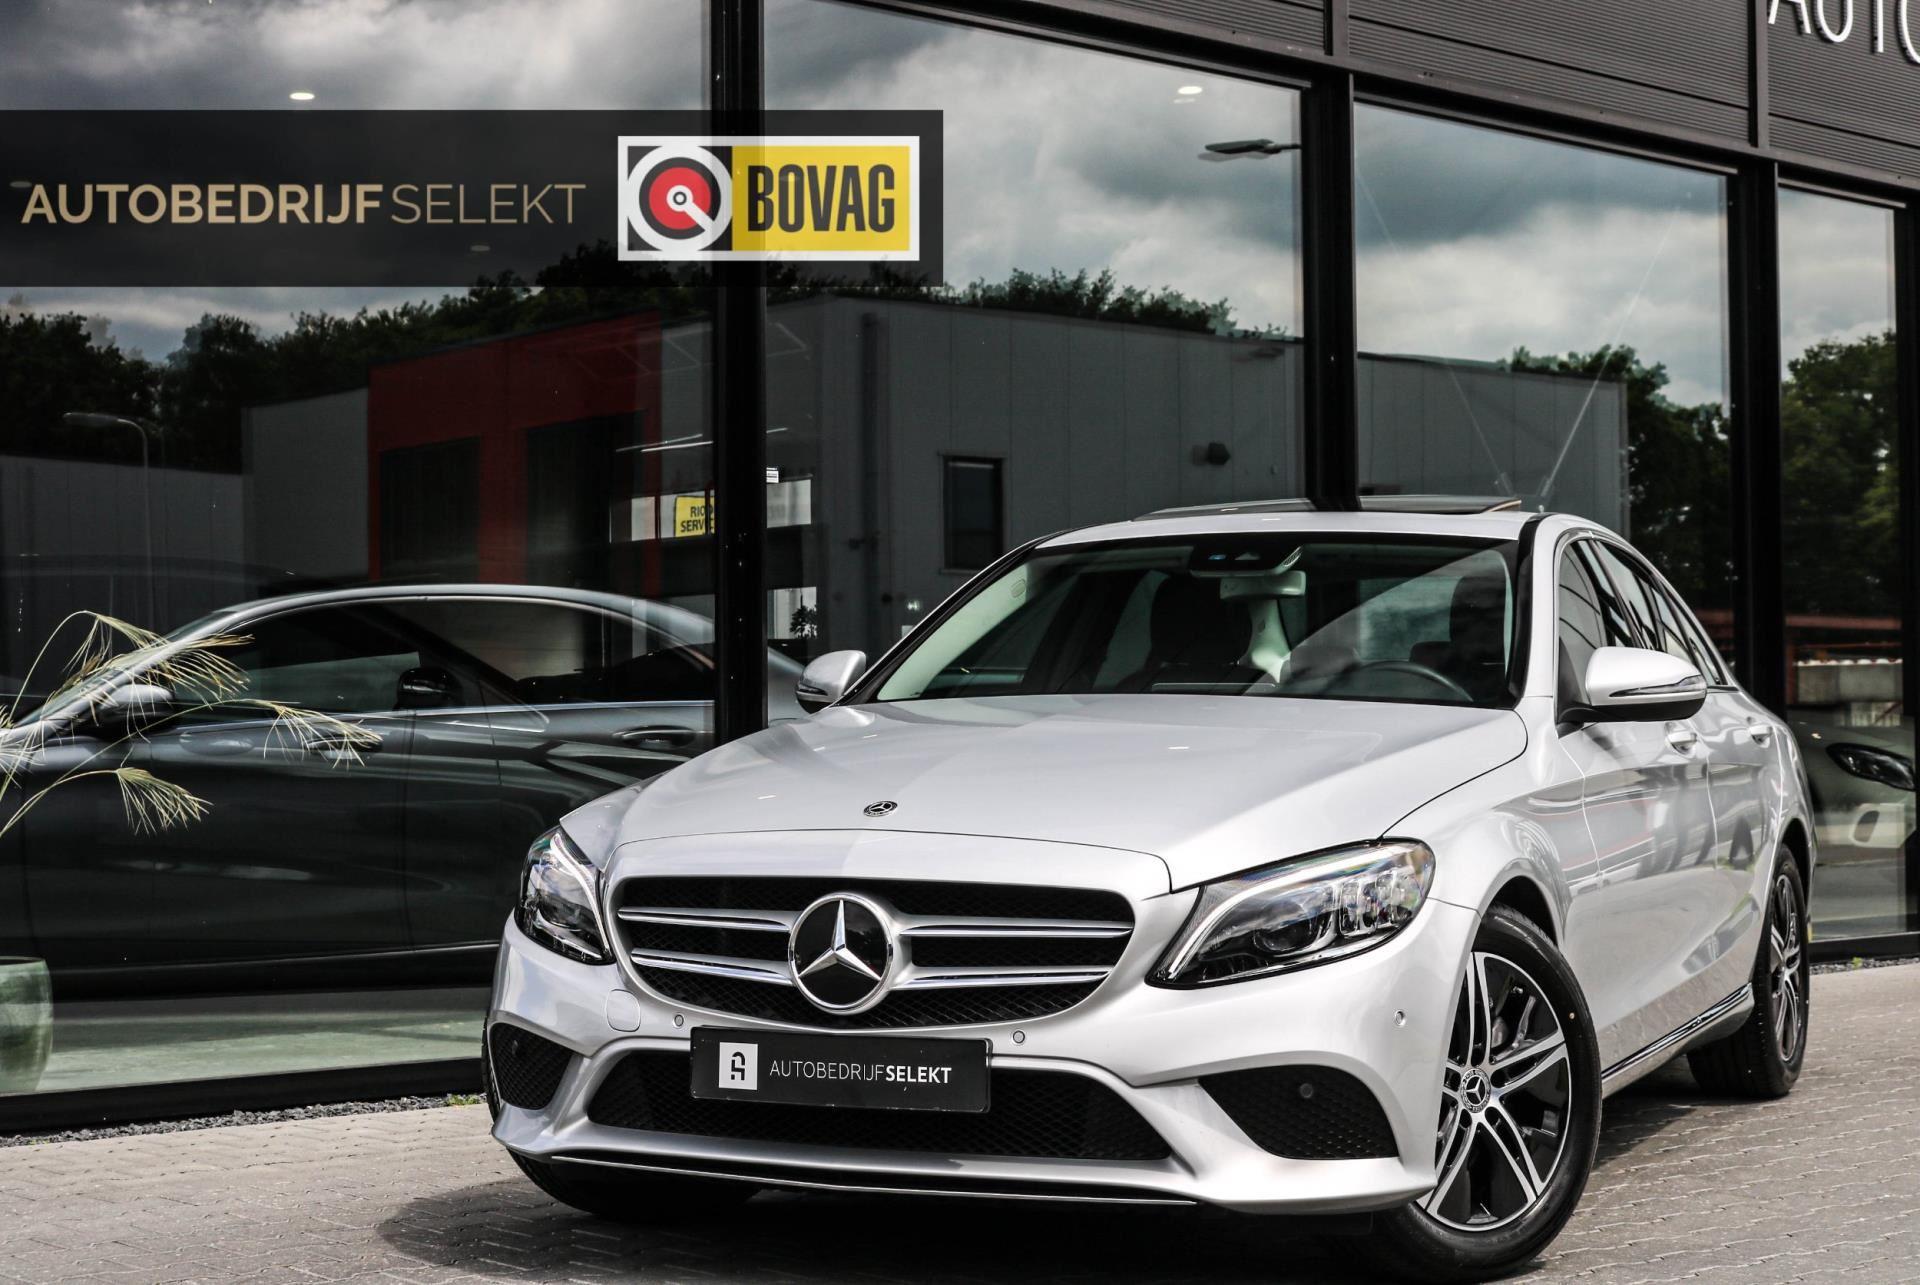 Mercedes-Benz C-klasse occasion - Autobedrijf Selekt B.V.